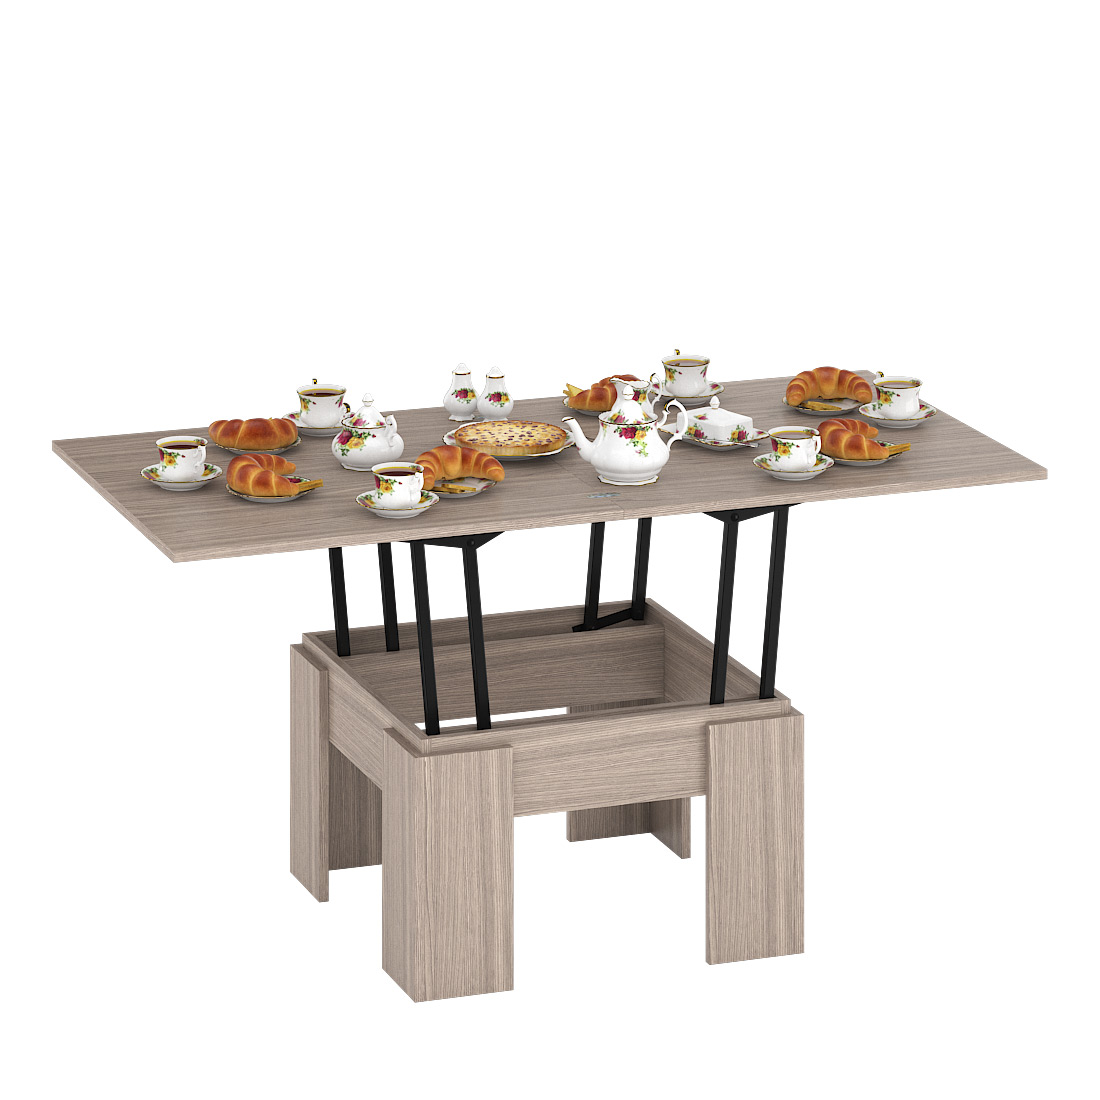 Журнальный столик Delice Бета 1668003 80(160)х80х47,5(81,5)